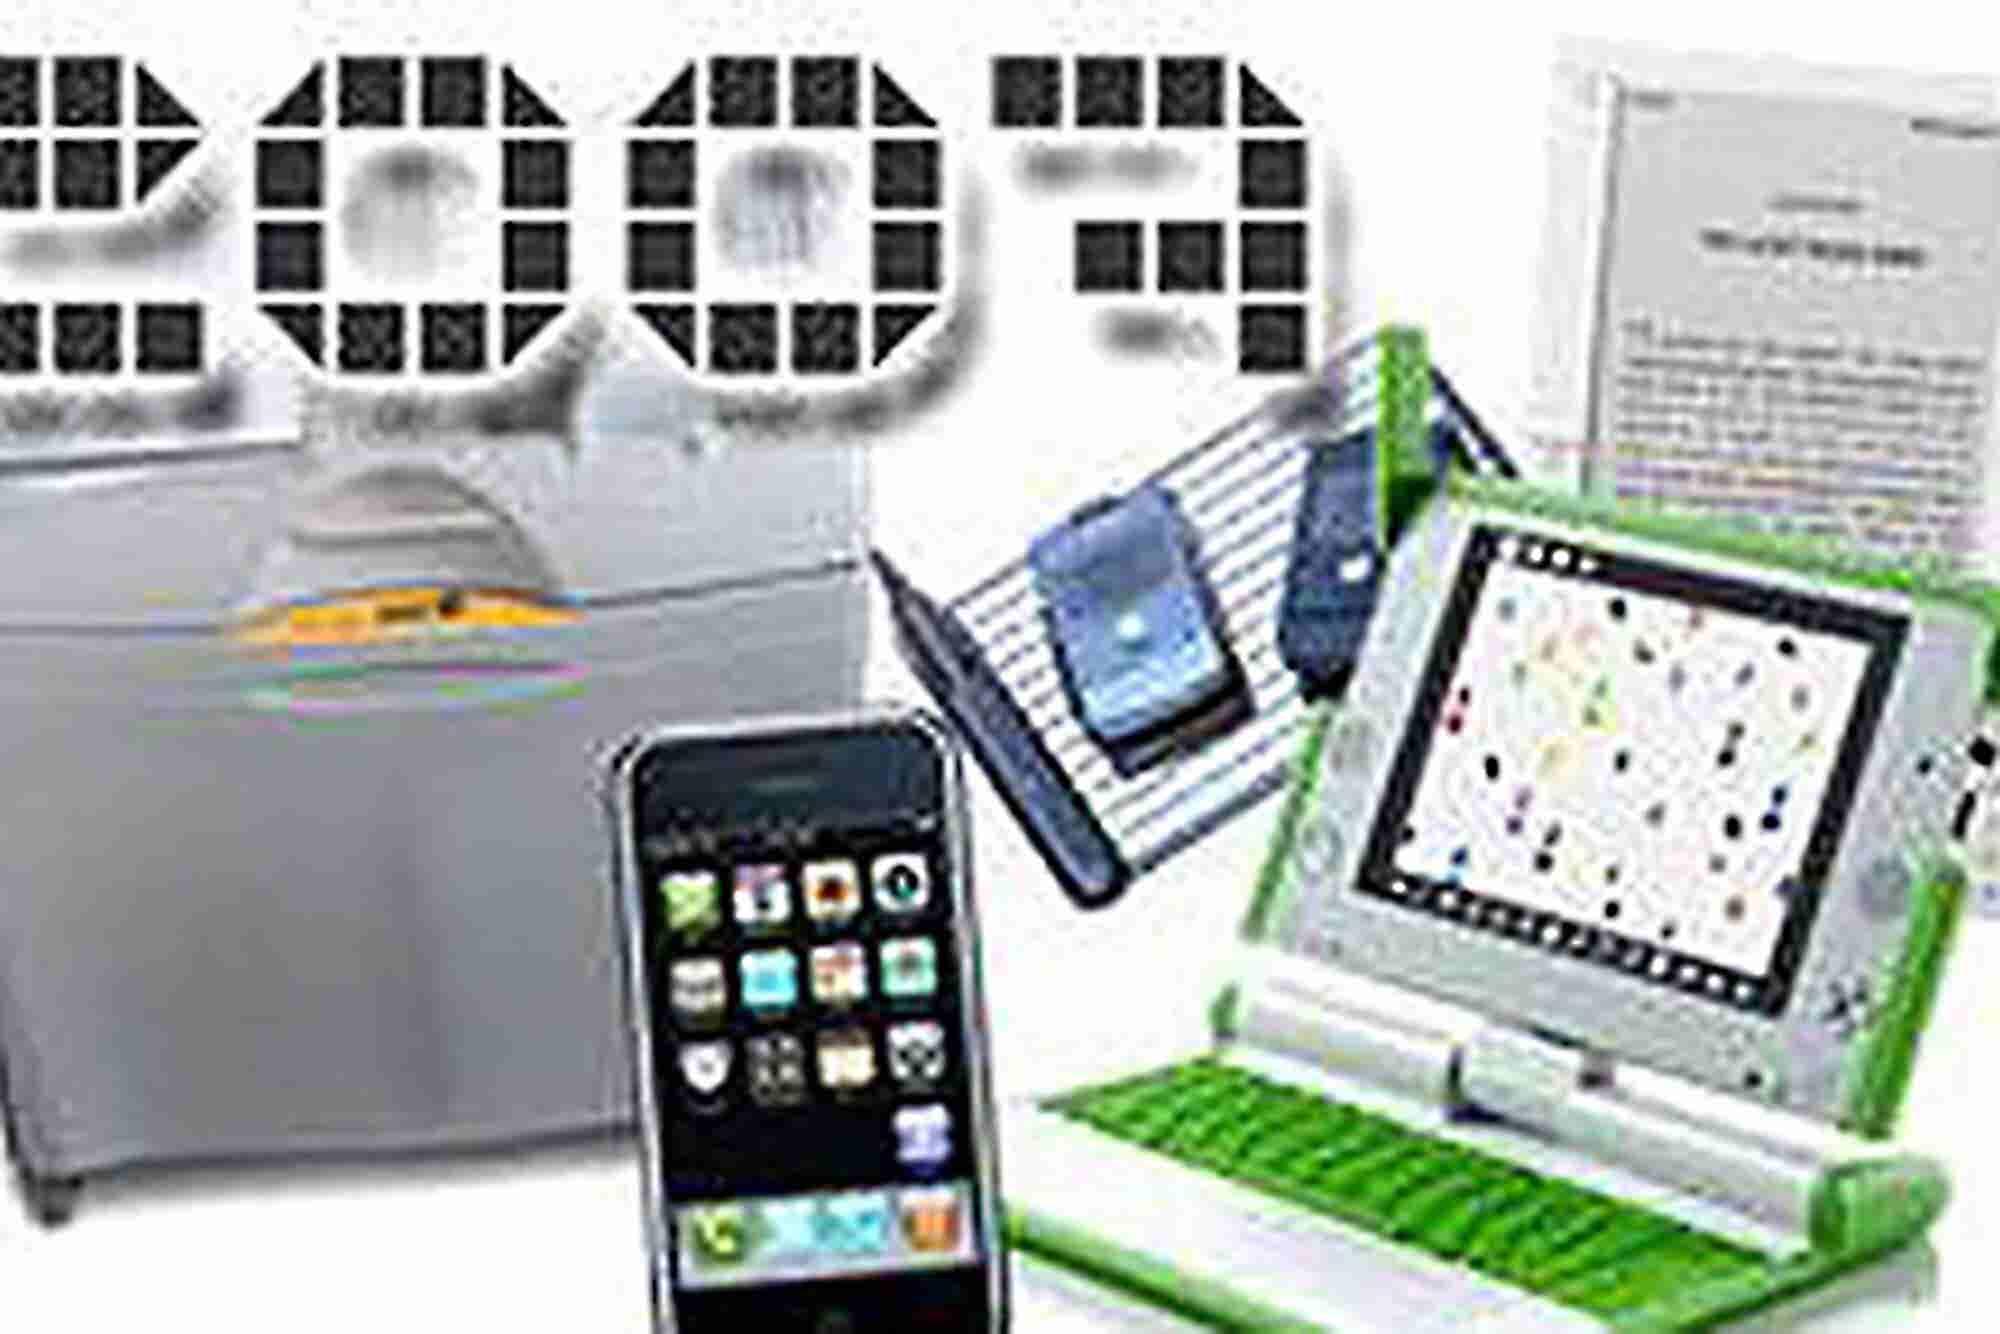 15 Revolutionary Inventions of 2007